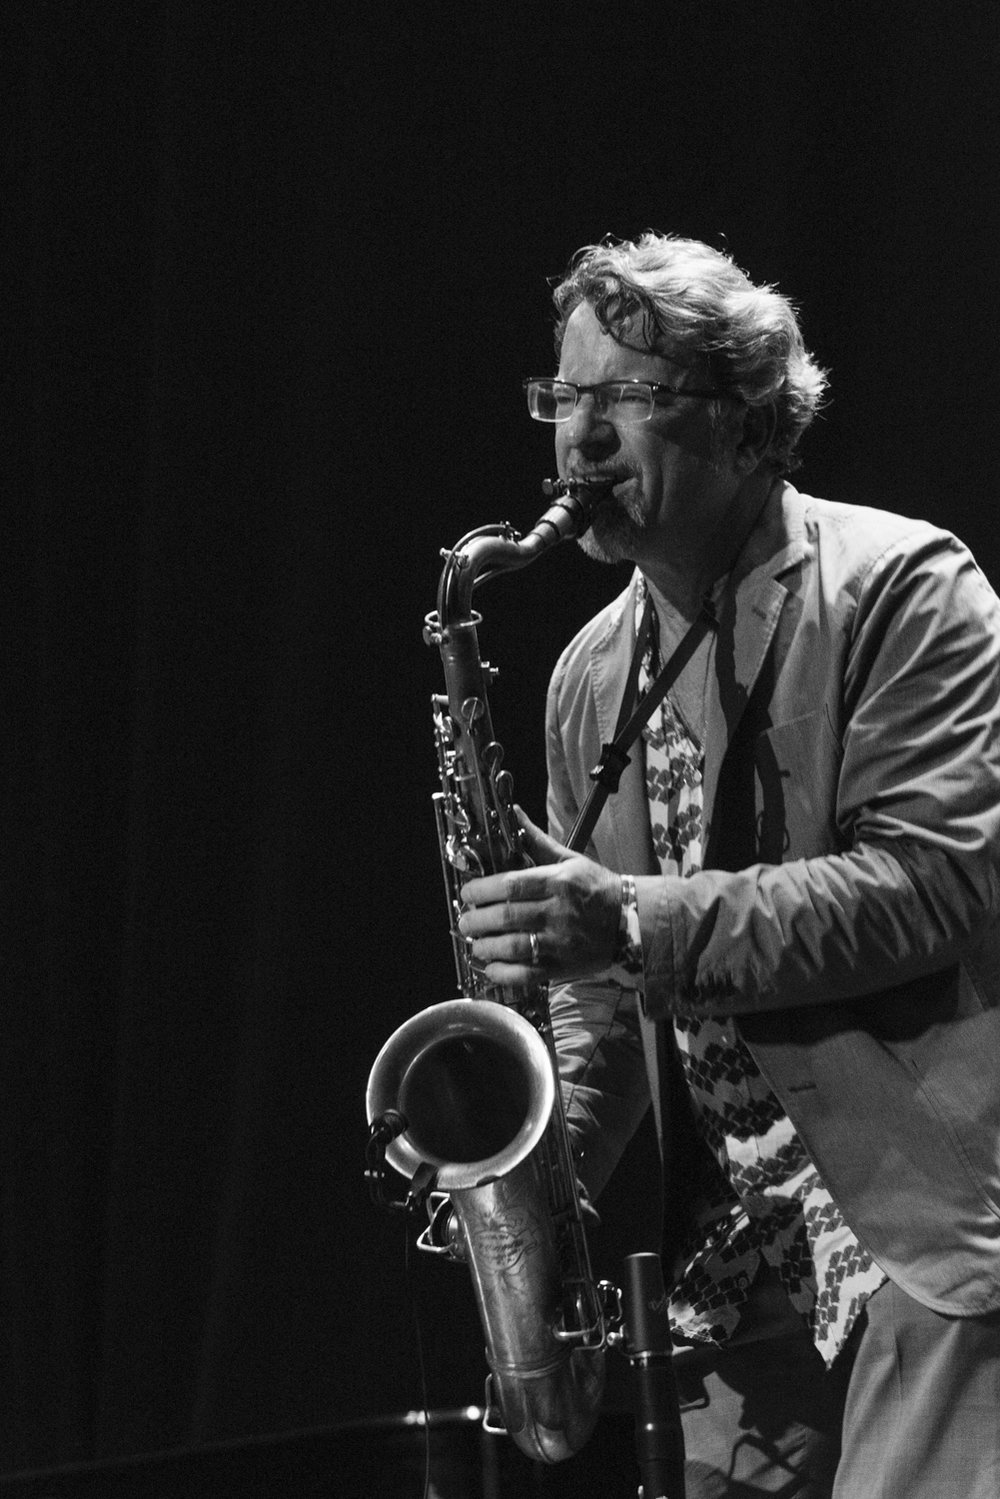 Jeff Lederer, Azores 2017